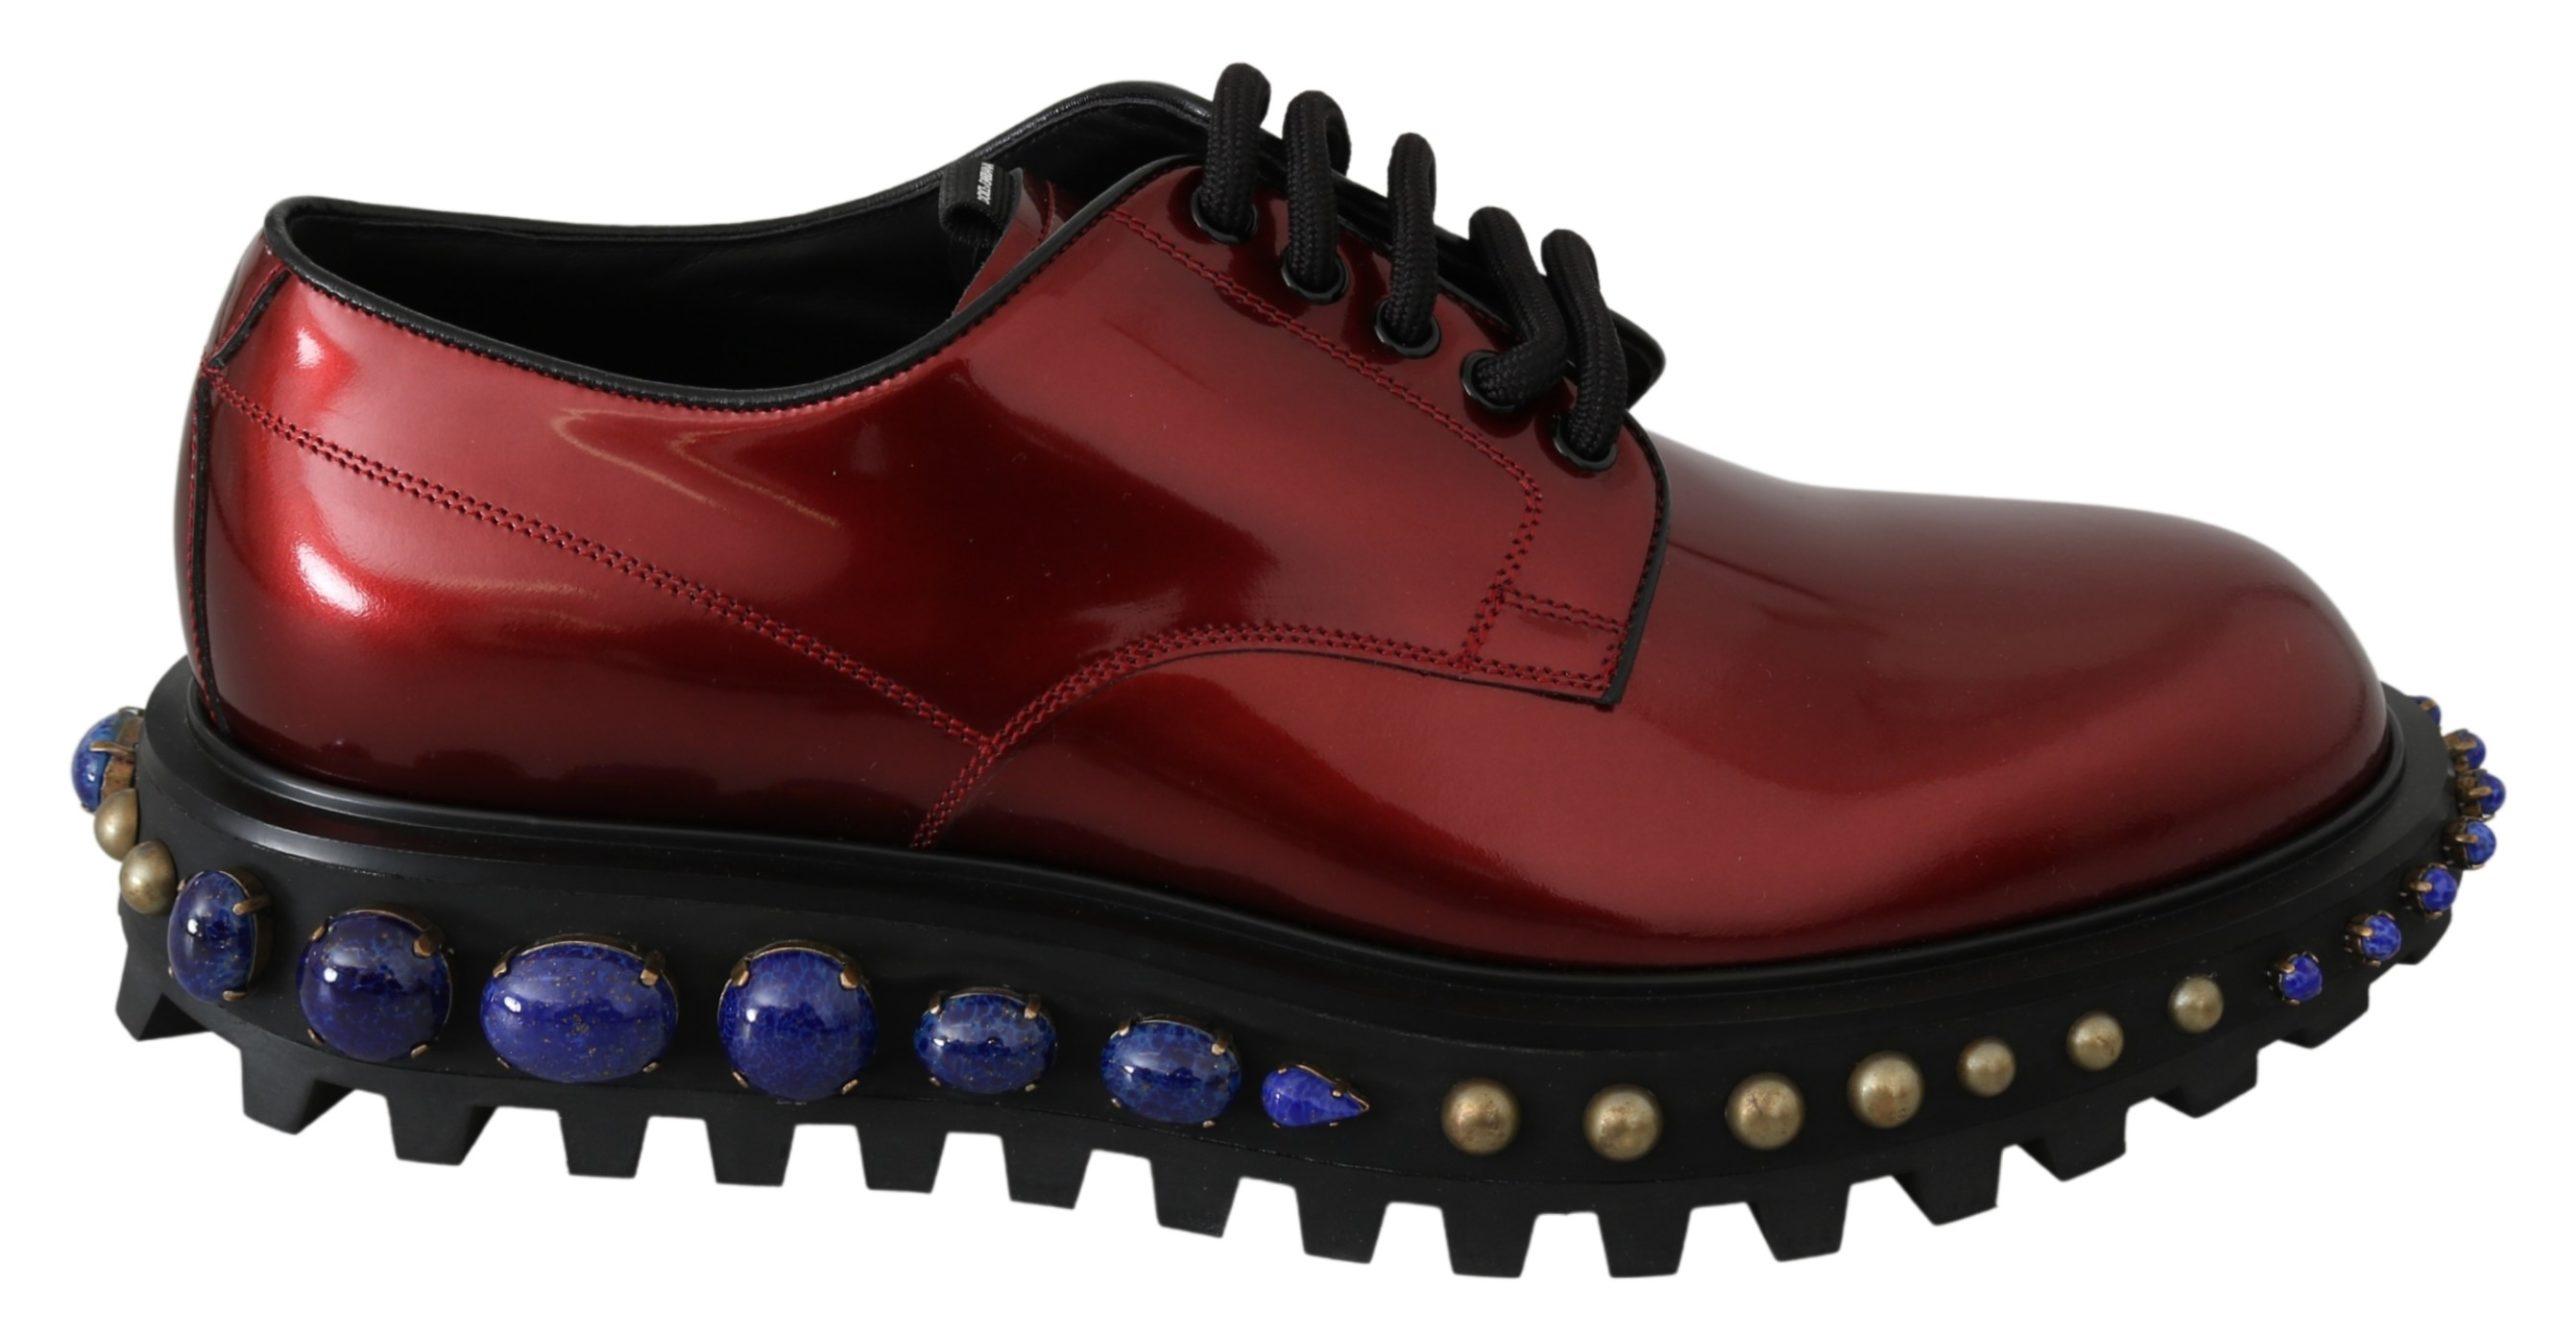 Dolce & Gabbana Men's Leather Crystals Studded Derby Shoe Red MV3005 - EU42/US9